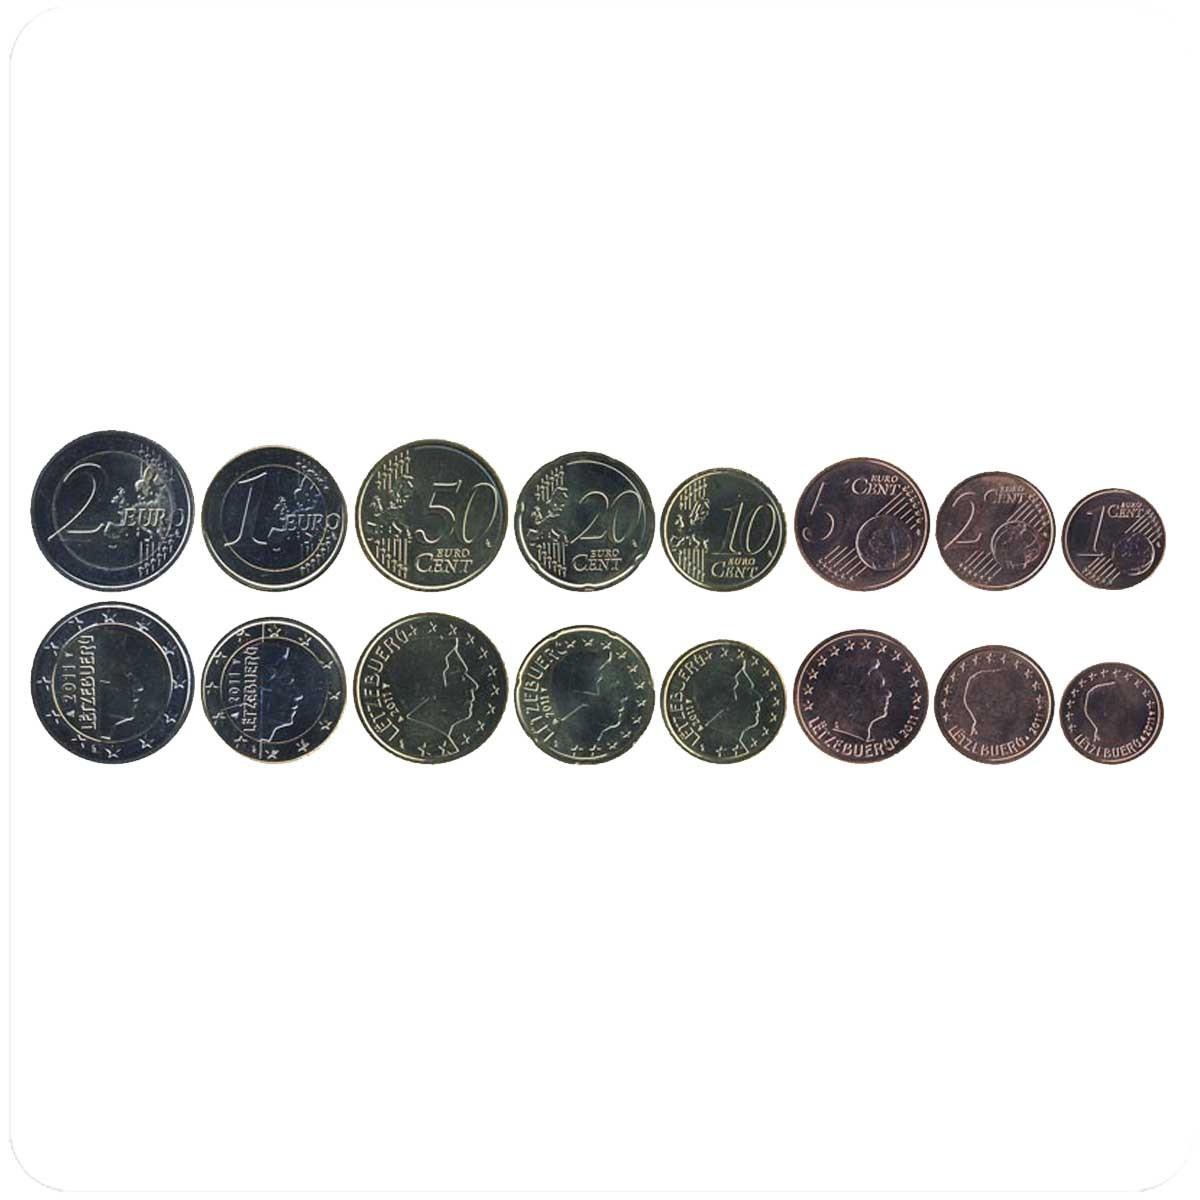 Люксембург годовой набор монет евро 2011 года